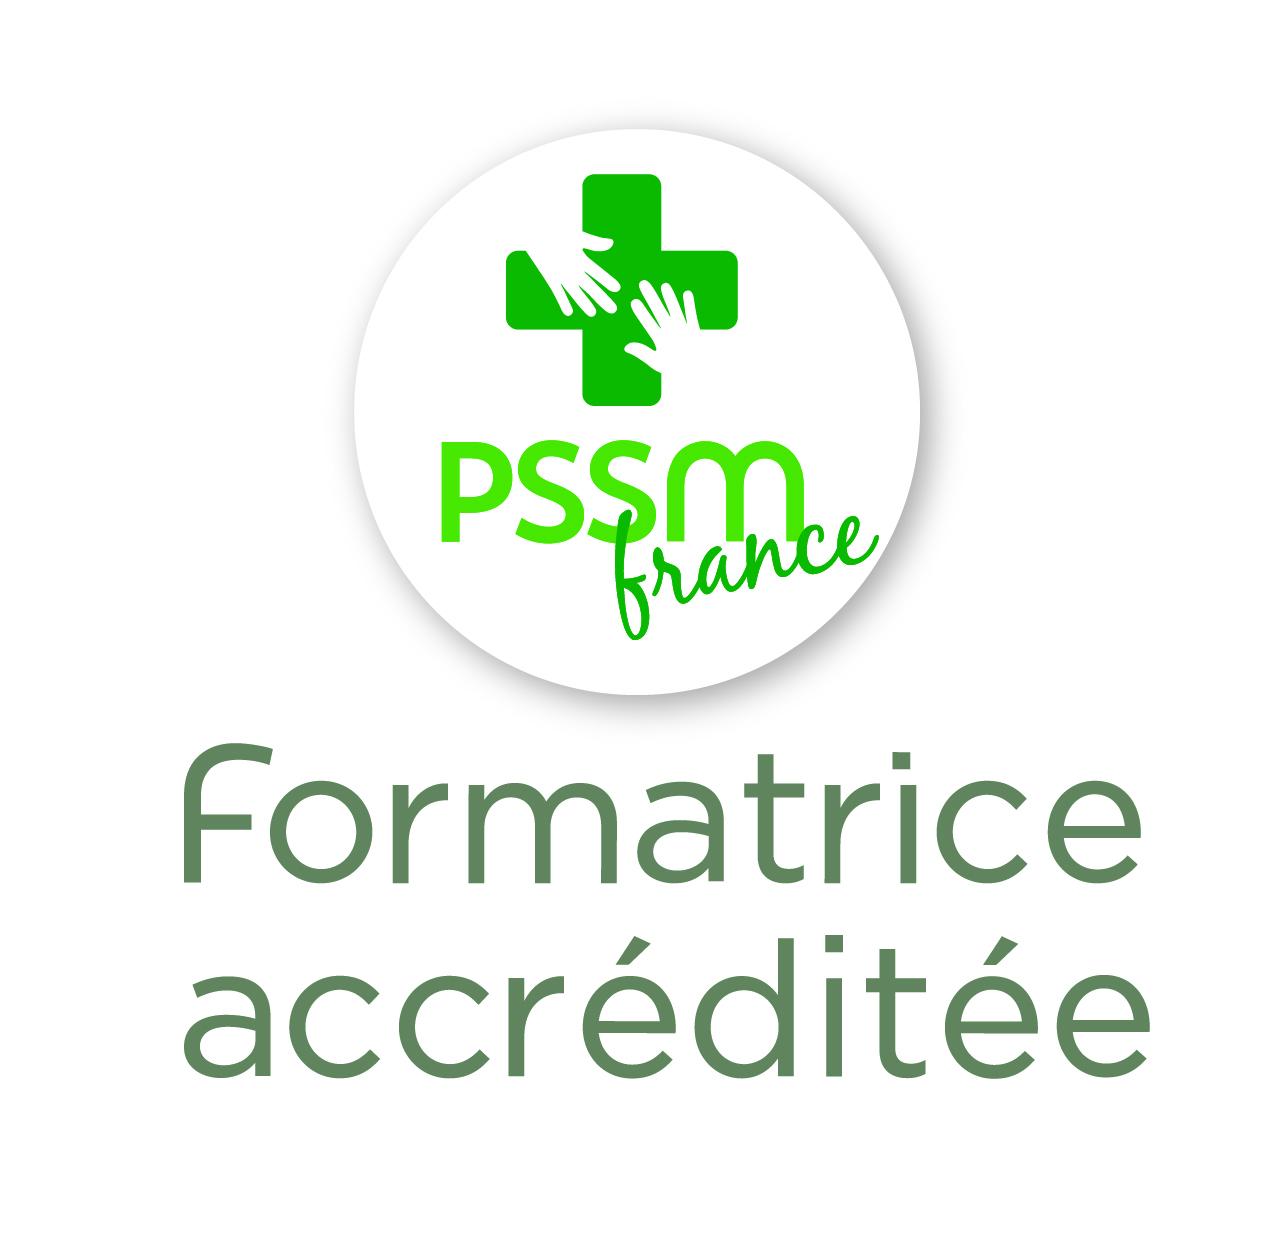 PSSM Formatrice accréditée